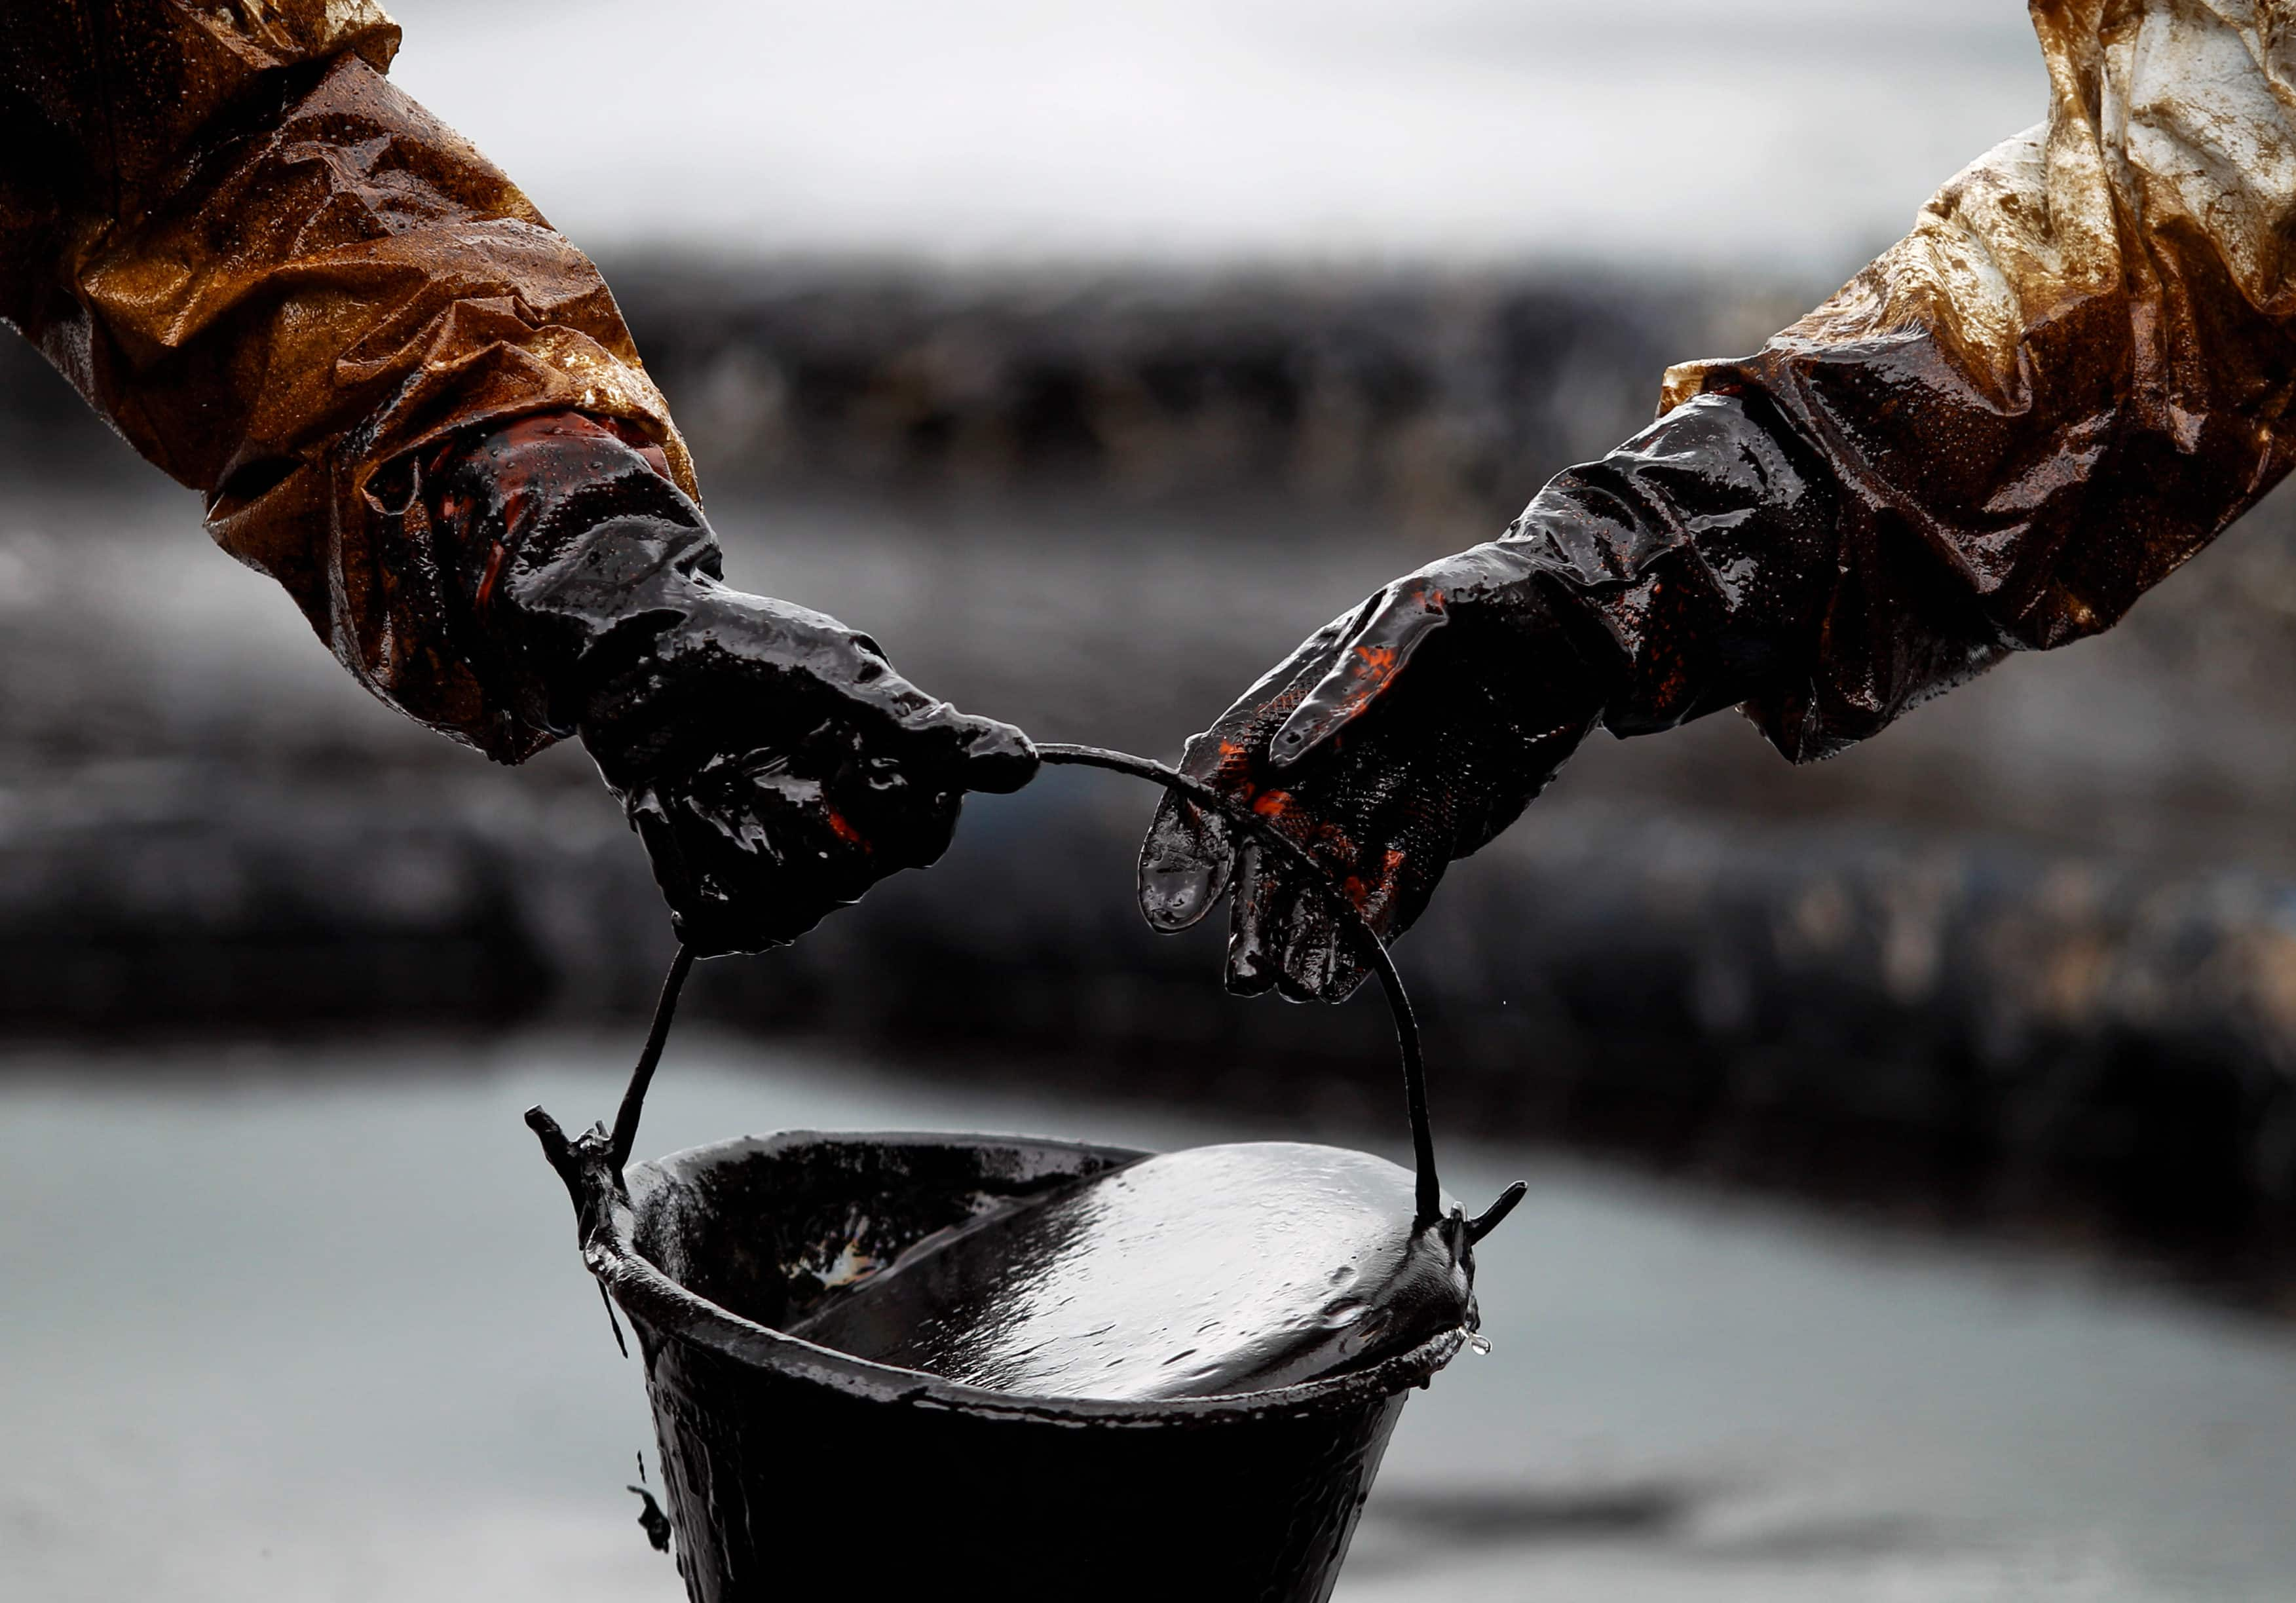 Цiль по нафтi визначена. Эквадор закрив експорт нафти.